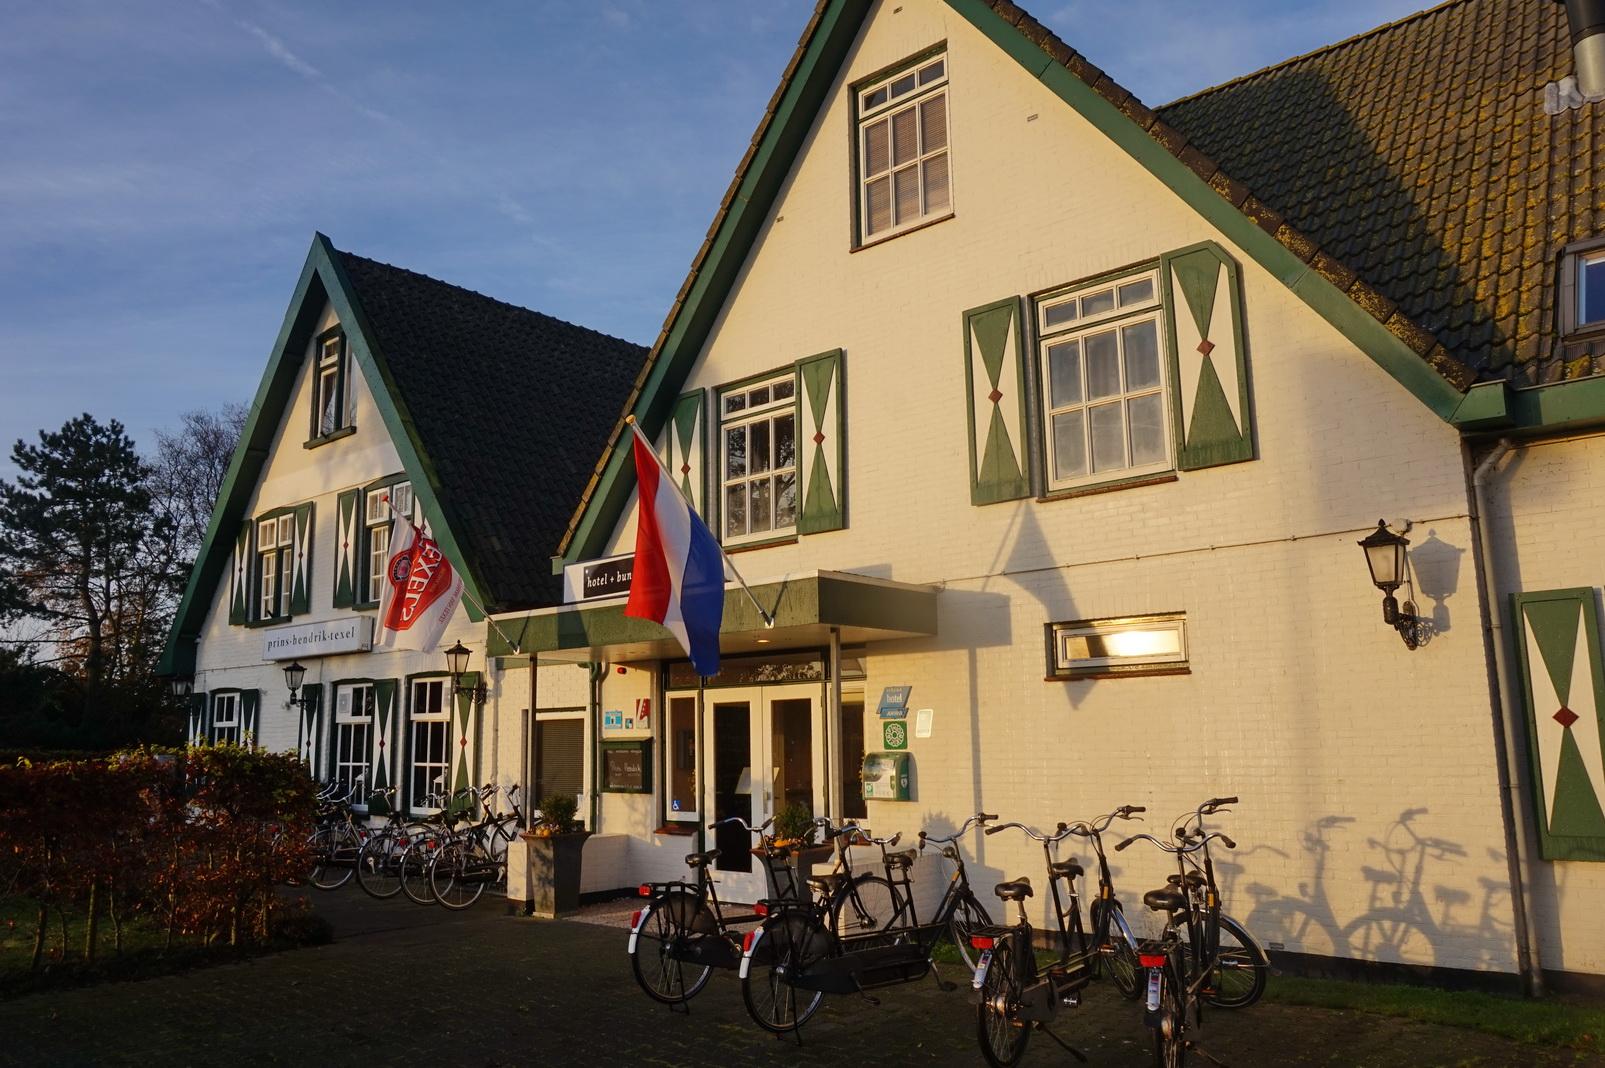 Texel Hotel Prins Hendrik Aussen 1